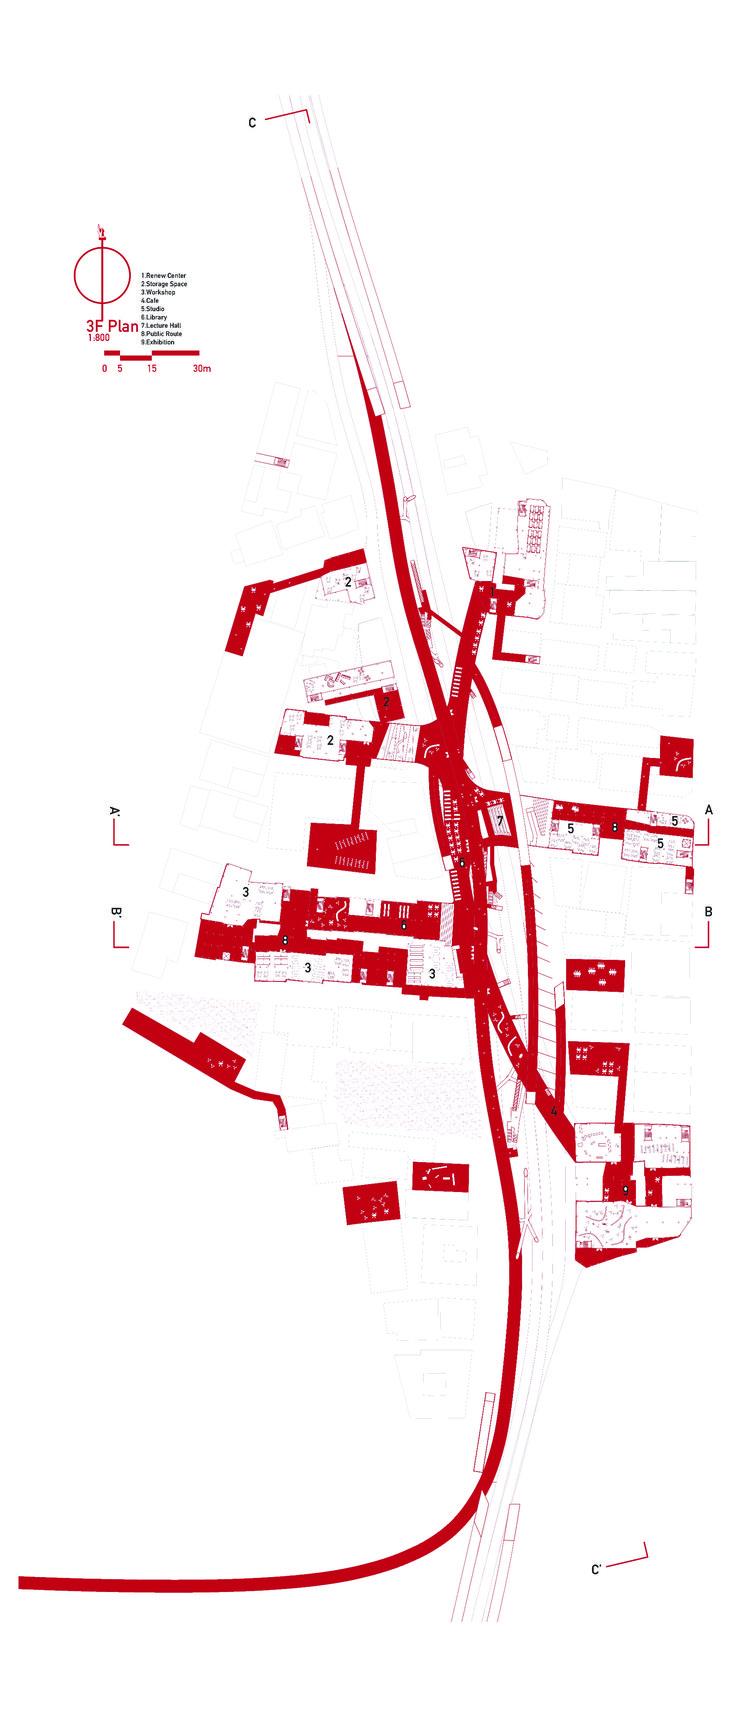 Plan / BIG Architecture renewal proposal, 2014 / By Max Zhong